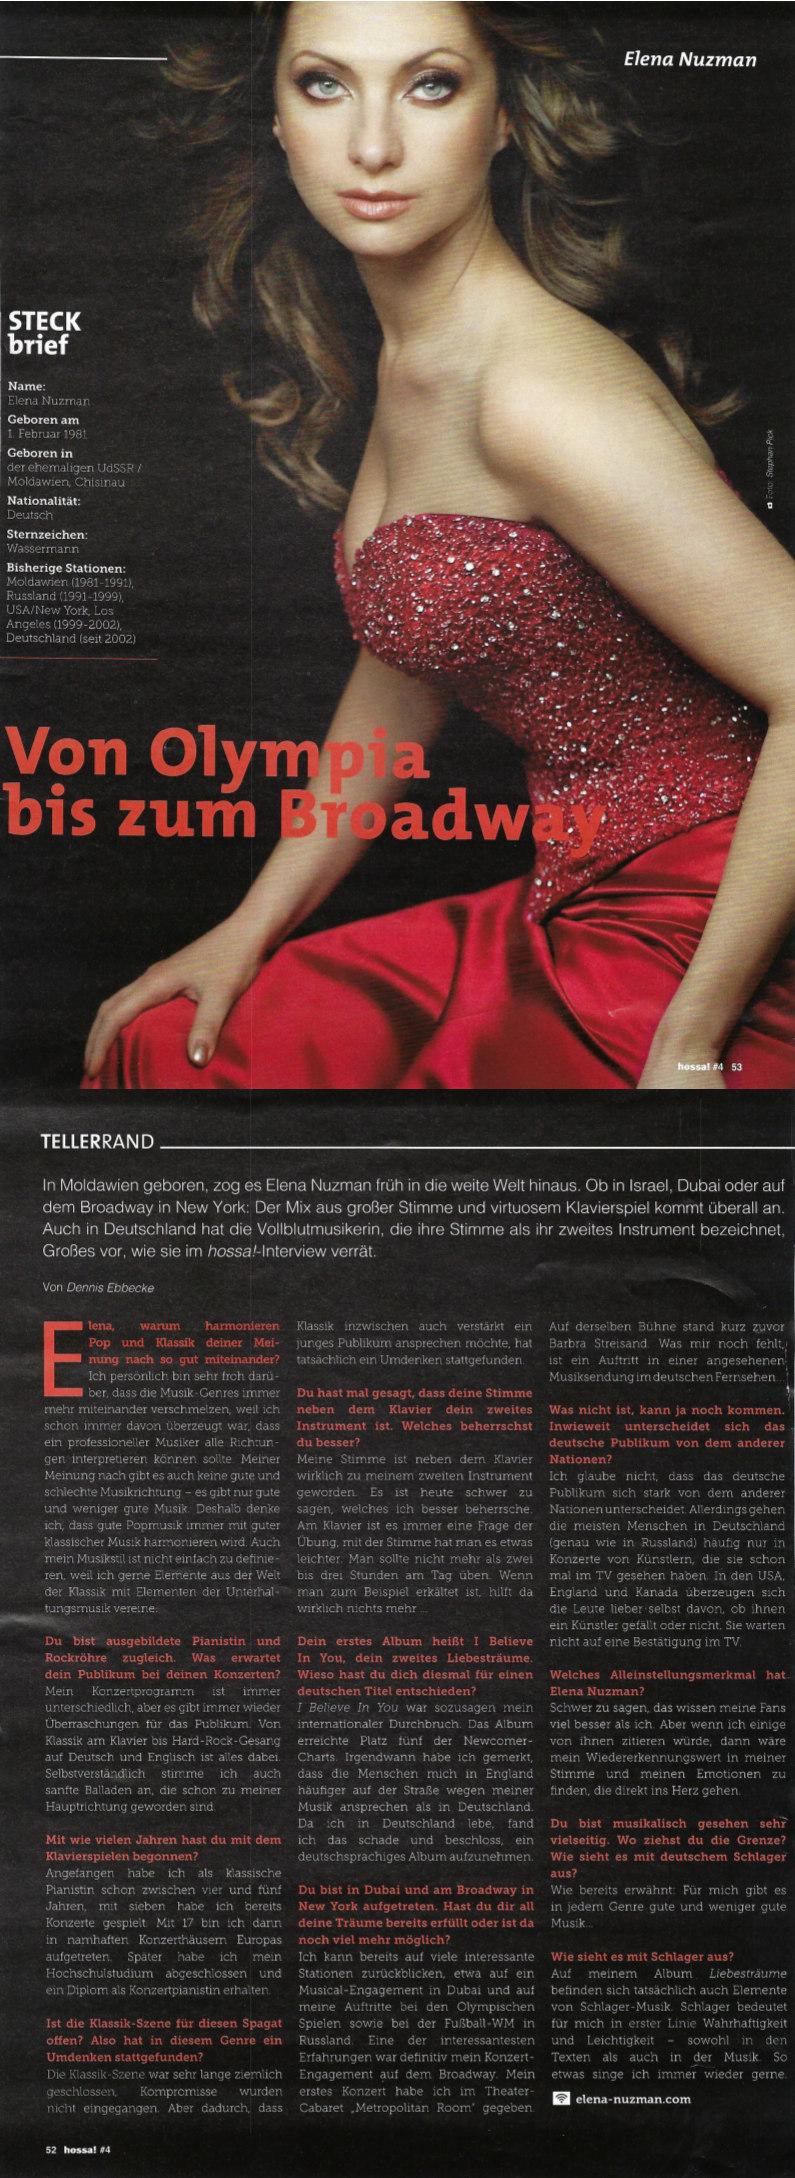 Elena Nuzman - hossa! - Magazin - March 2019